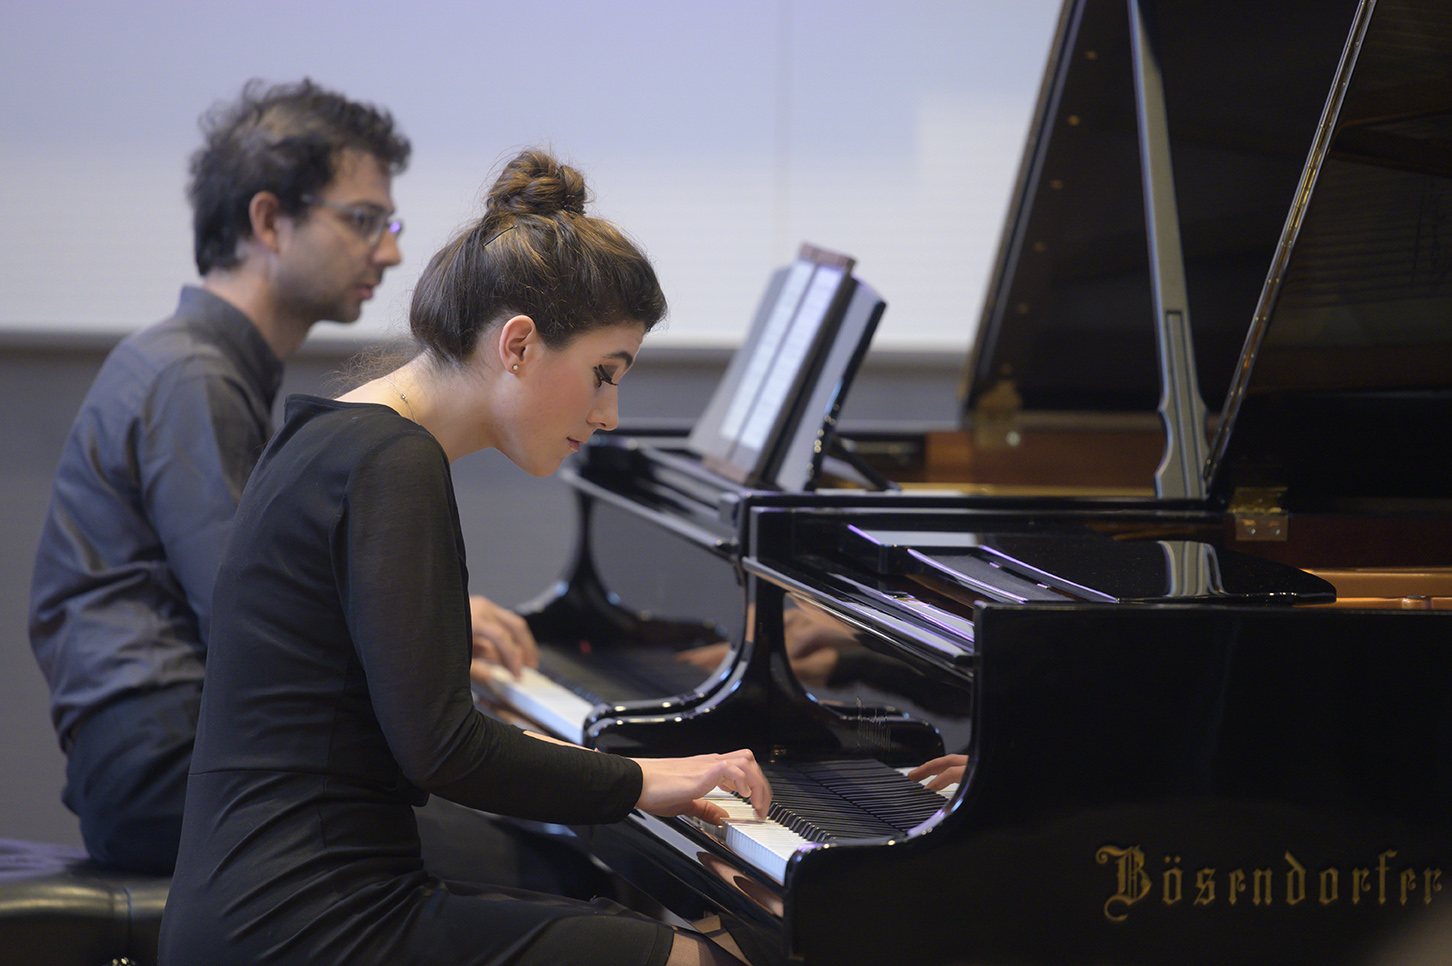 Georgiana Pletea, Finalist Rahn Musikpreis 2020 for piano